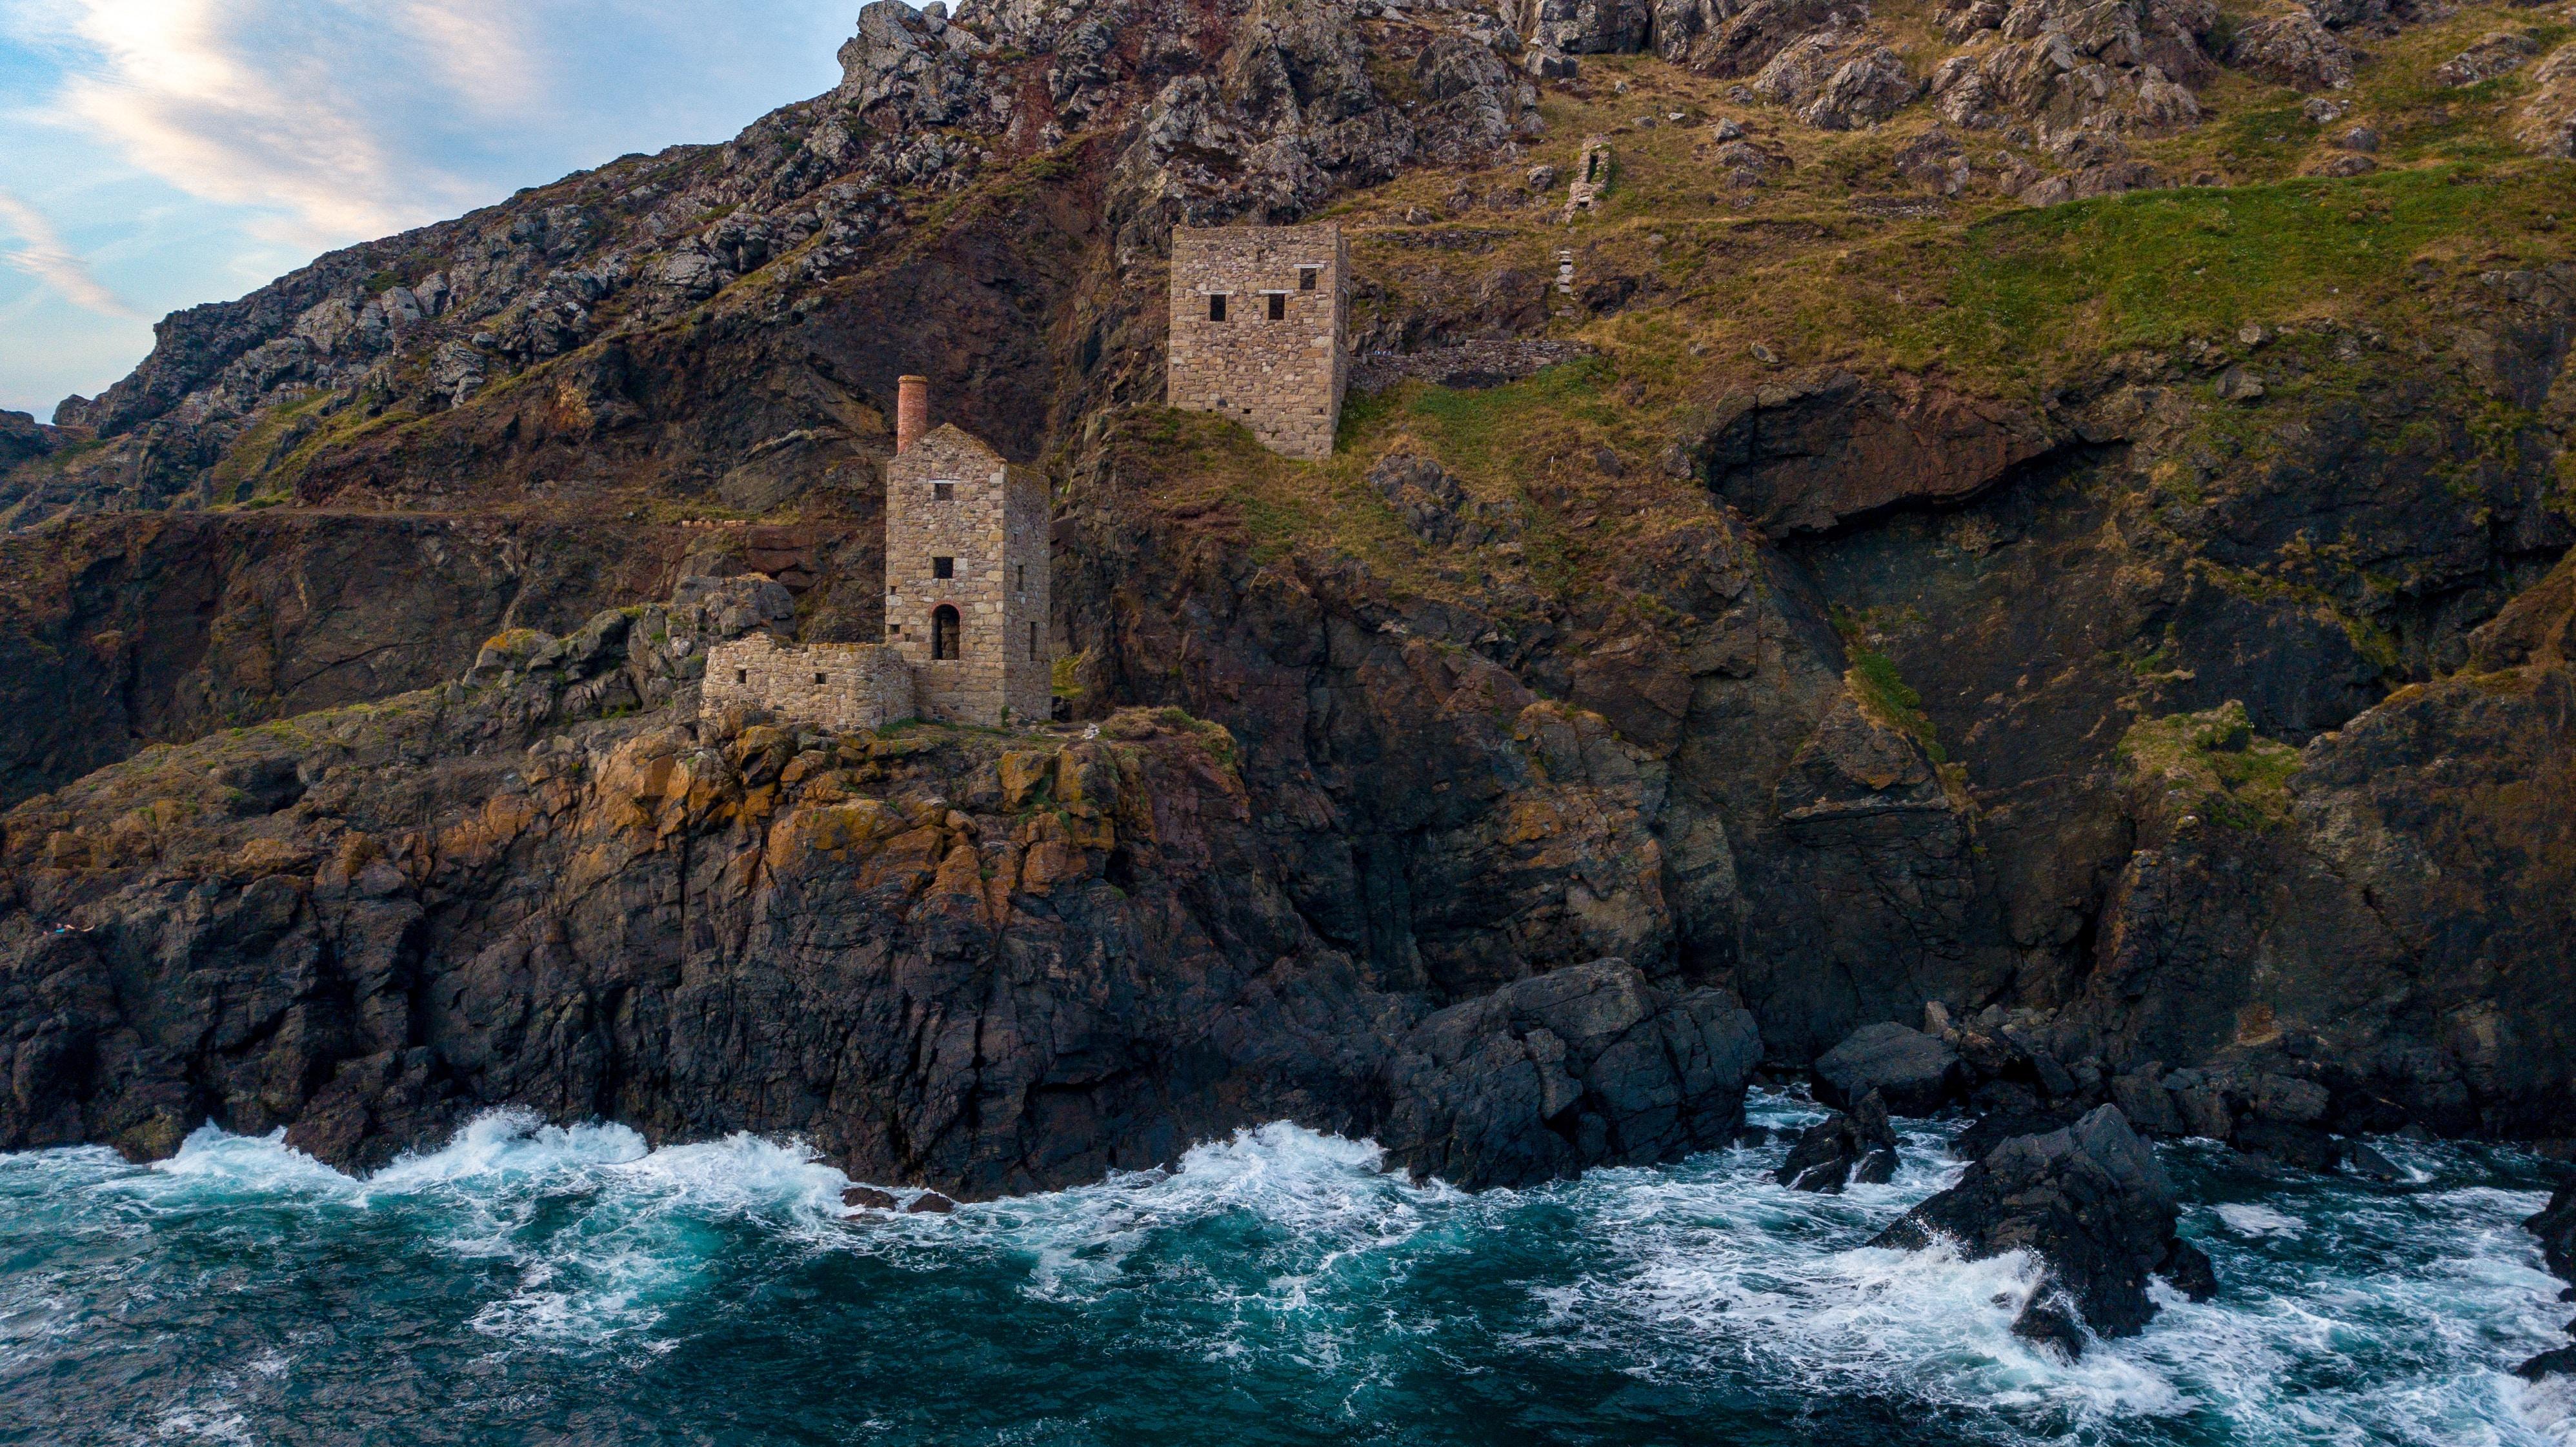 gray brick tower at cliff near ocean at daytime